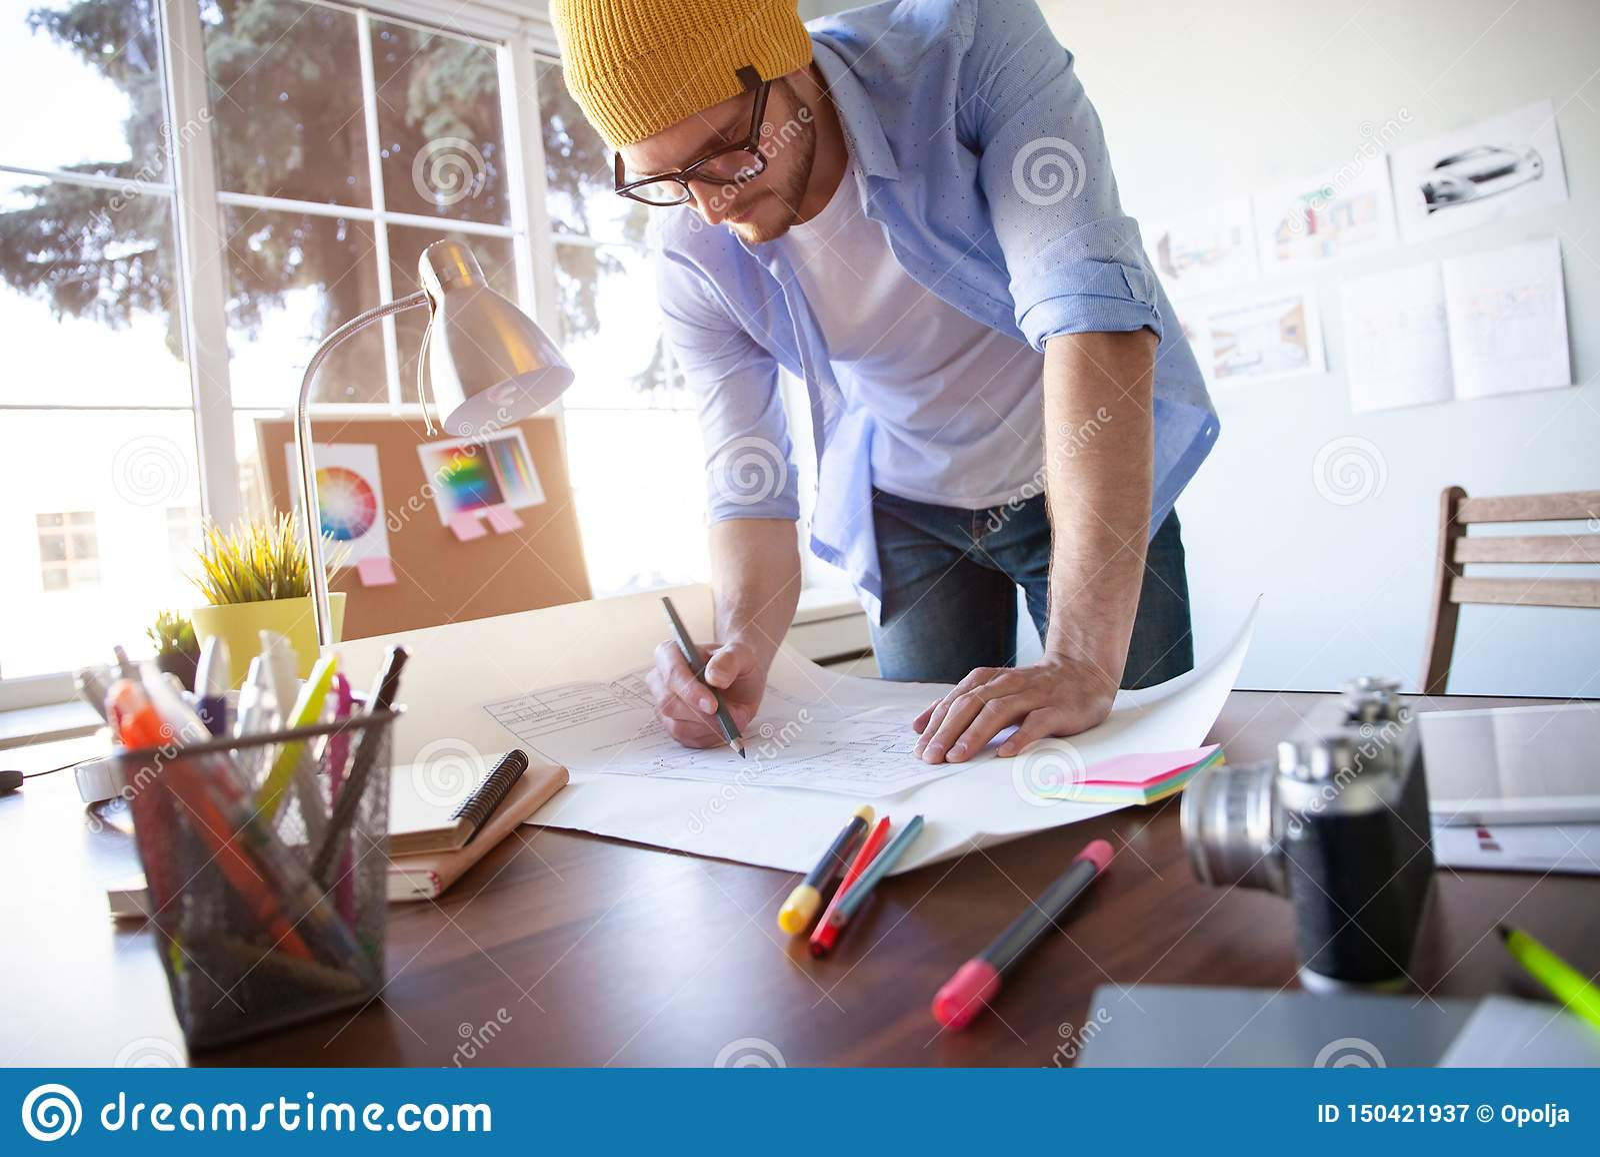 Concepto de Creative Occupation Blueprint del arquitecto del estudio del dise?o